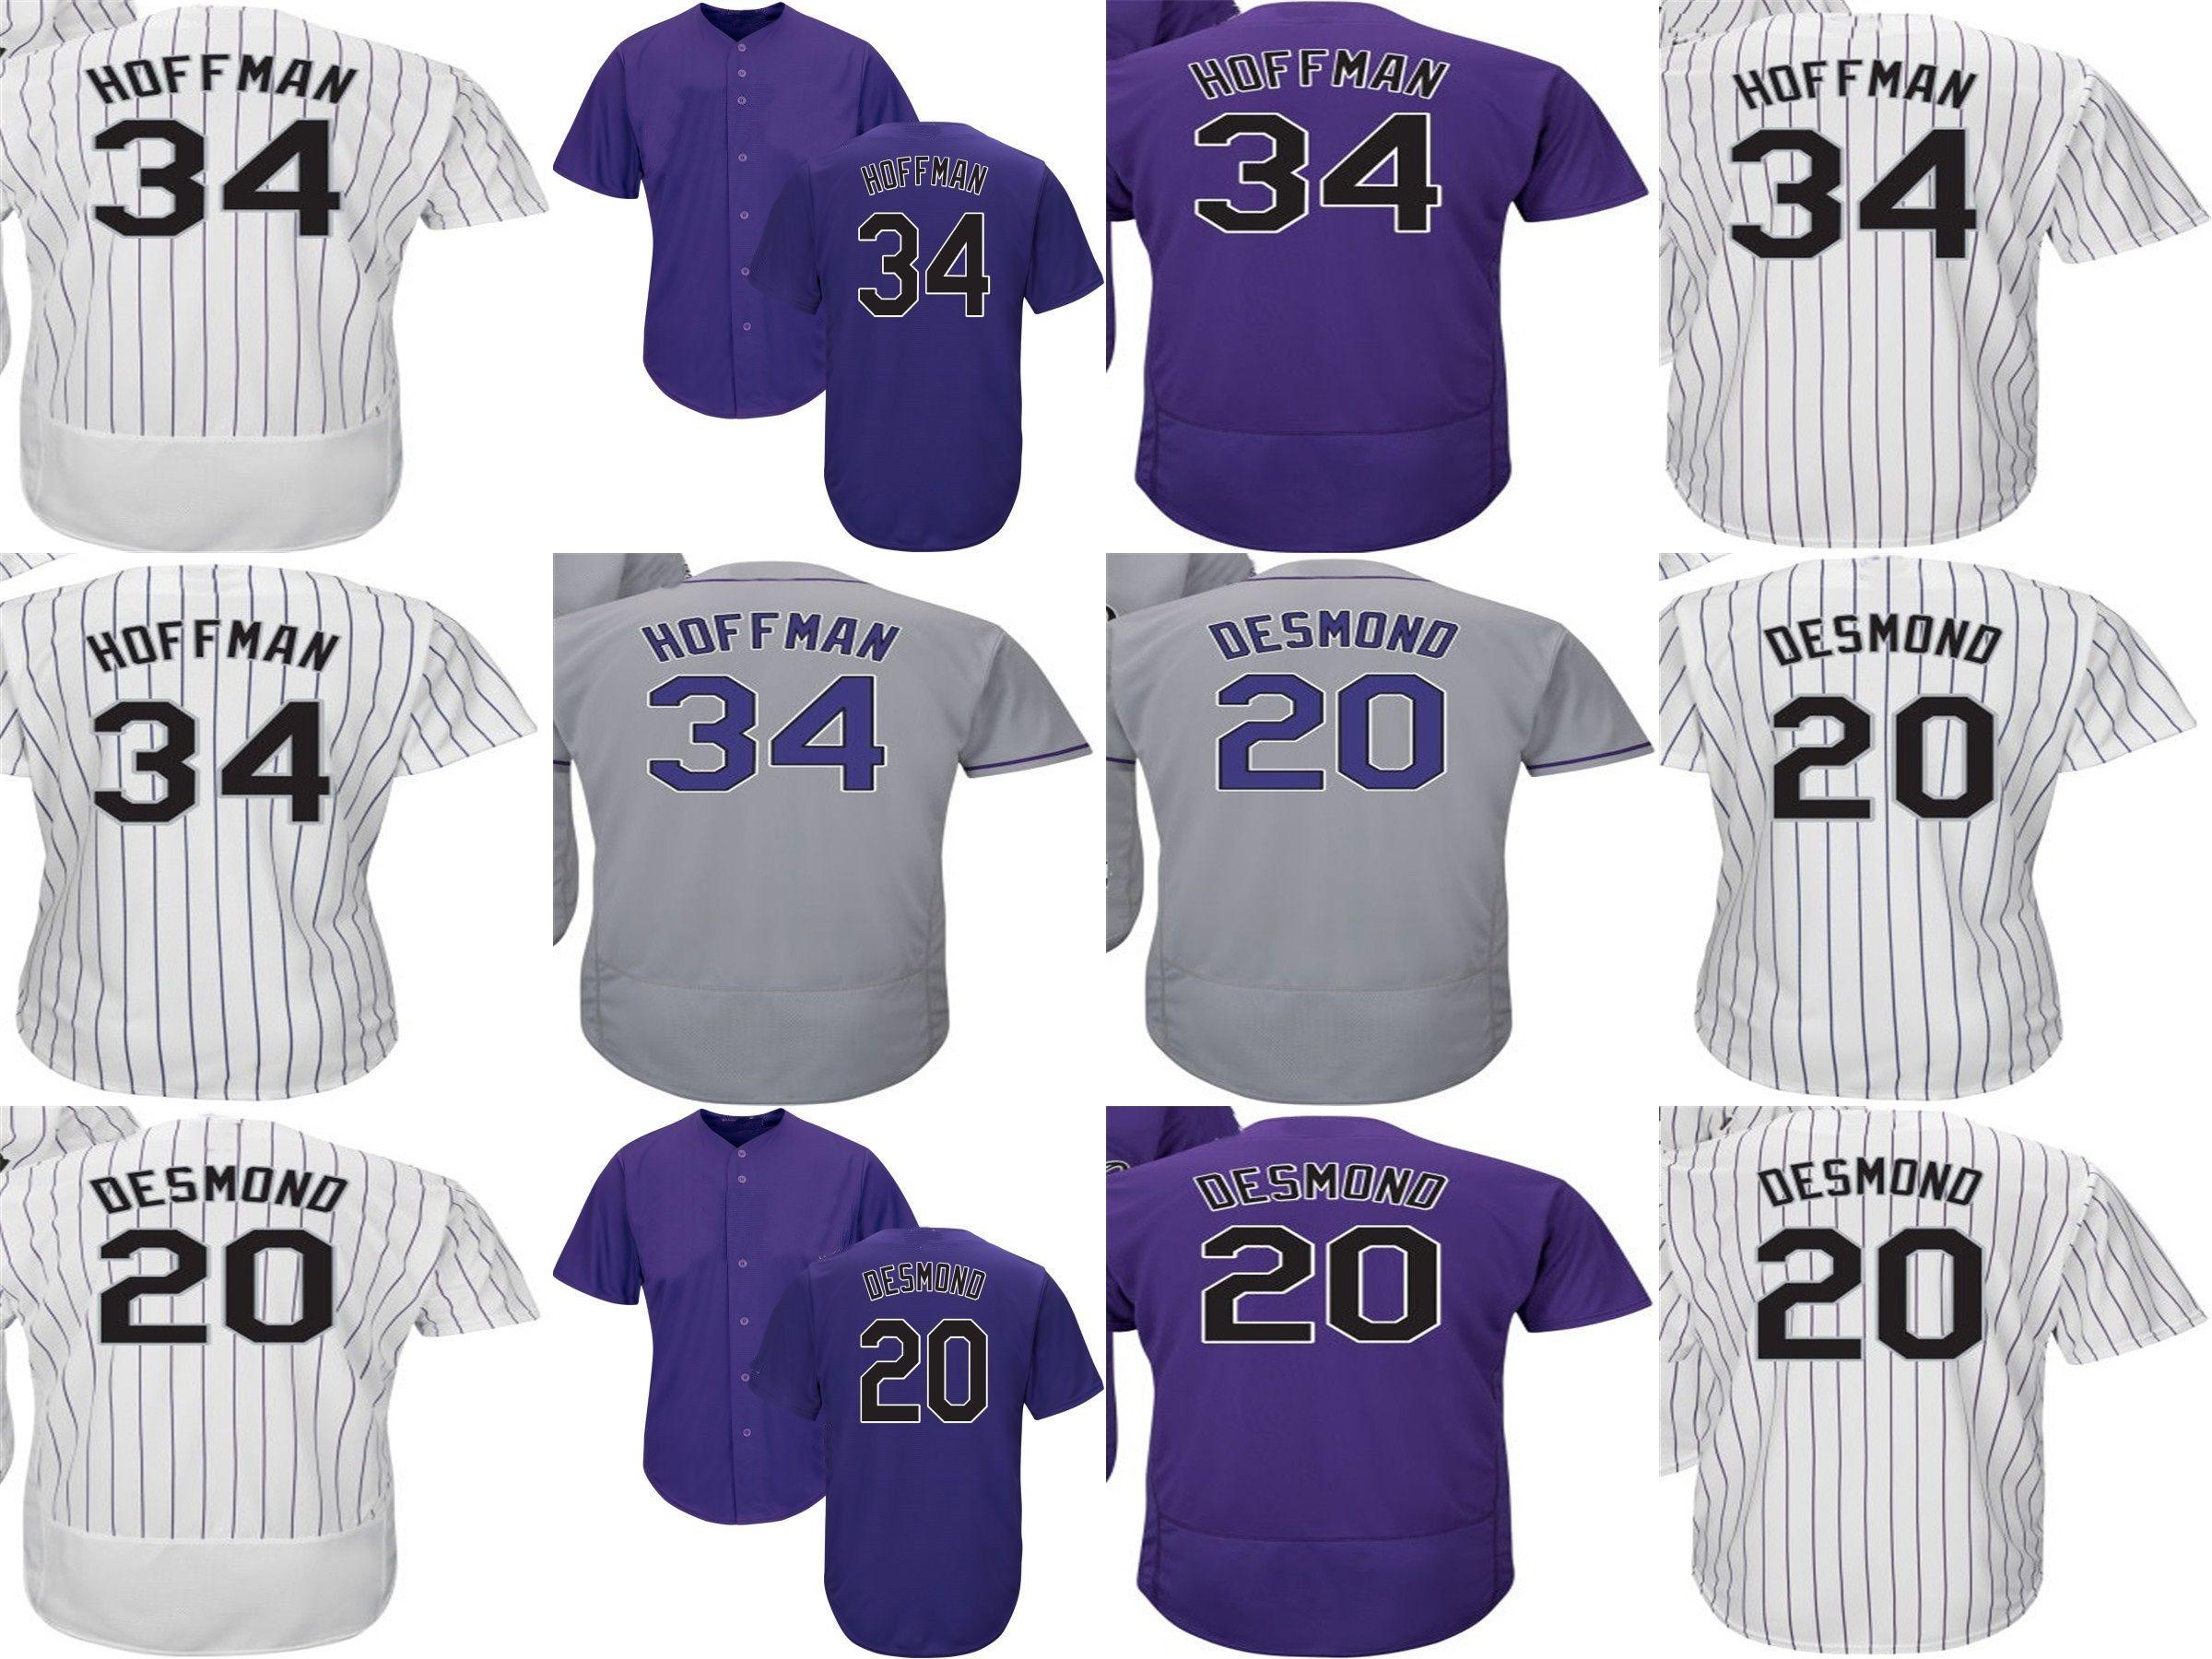 57d5f8463 ... best price newest mens ladys kids toddlers colorado jerseys 20 ian  desmond 34 jeff hoffman purple